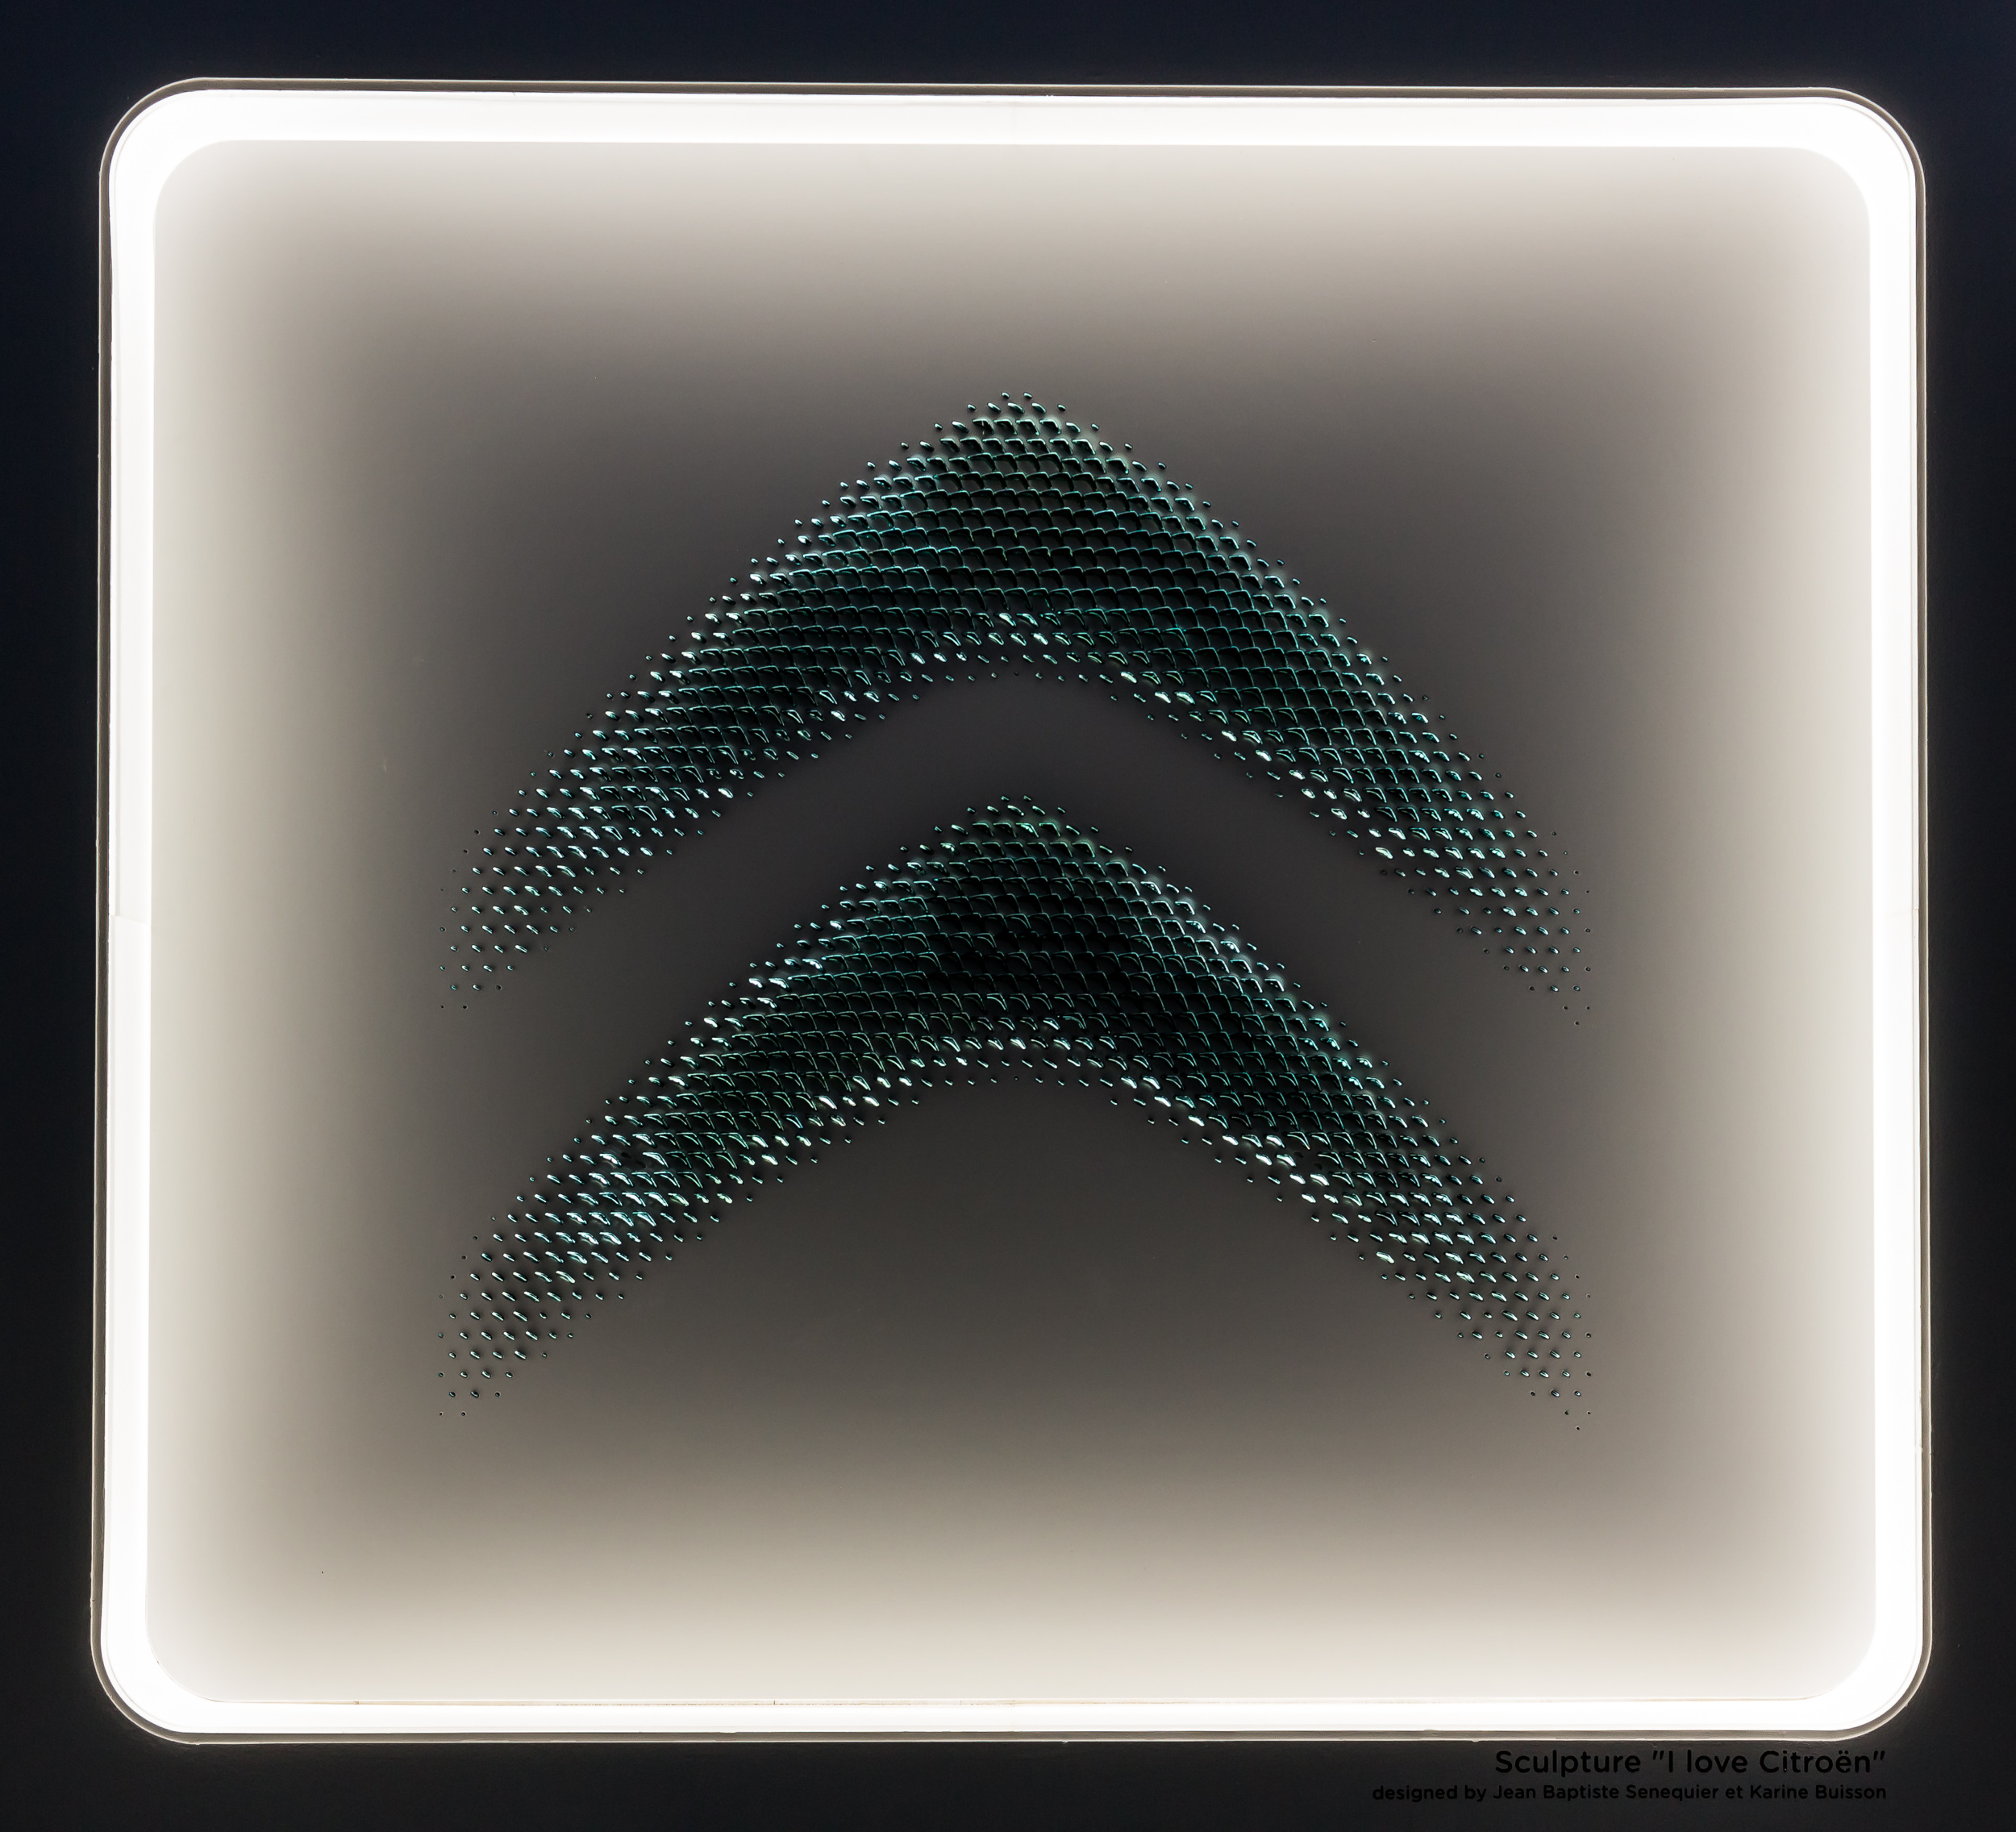 Citroën Sculpture